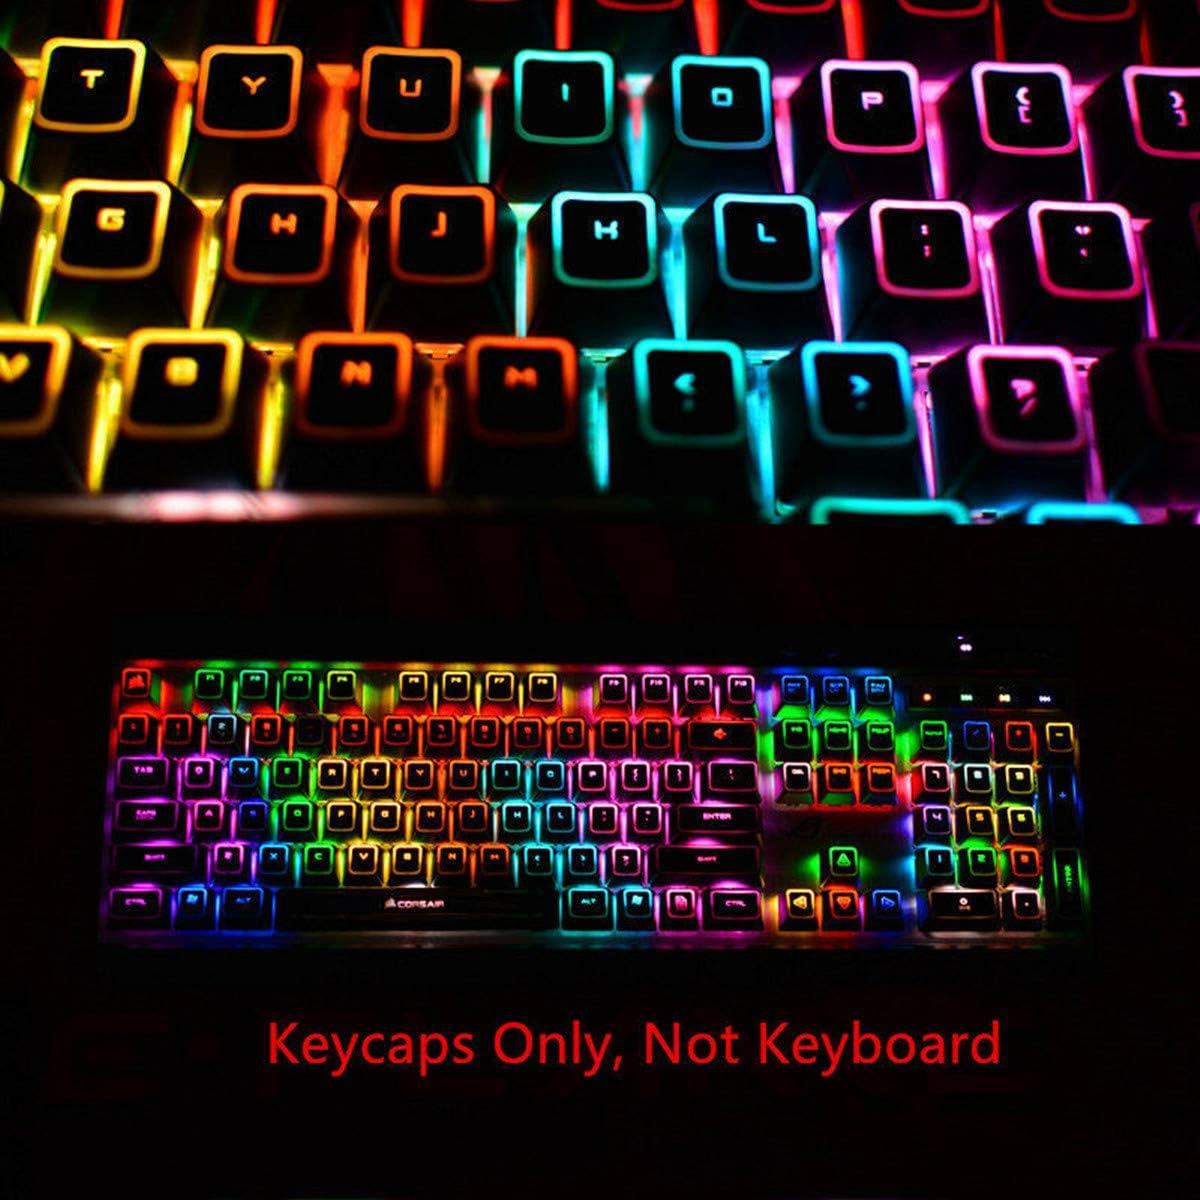 104 teclados ROG retroiluminados para Teclado mecánico Corsair K65 K68 K70 RGB K95 Platinum Strafe